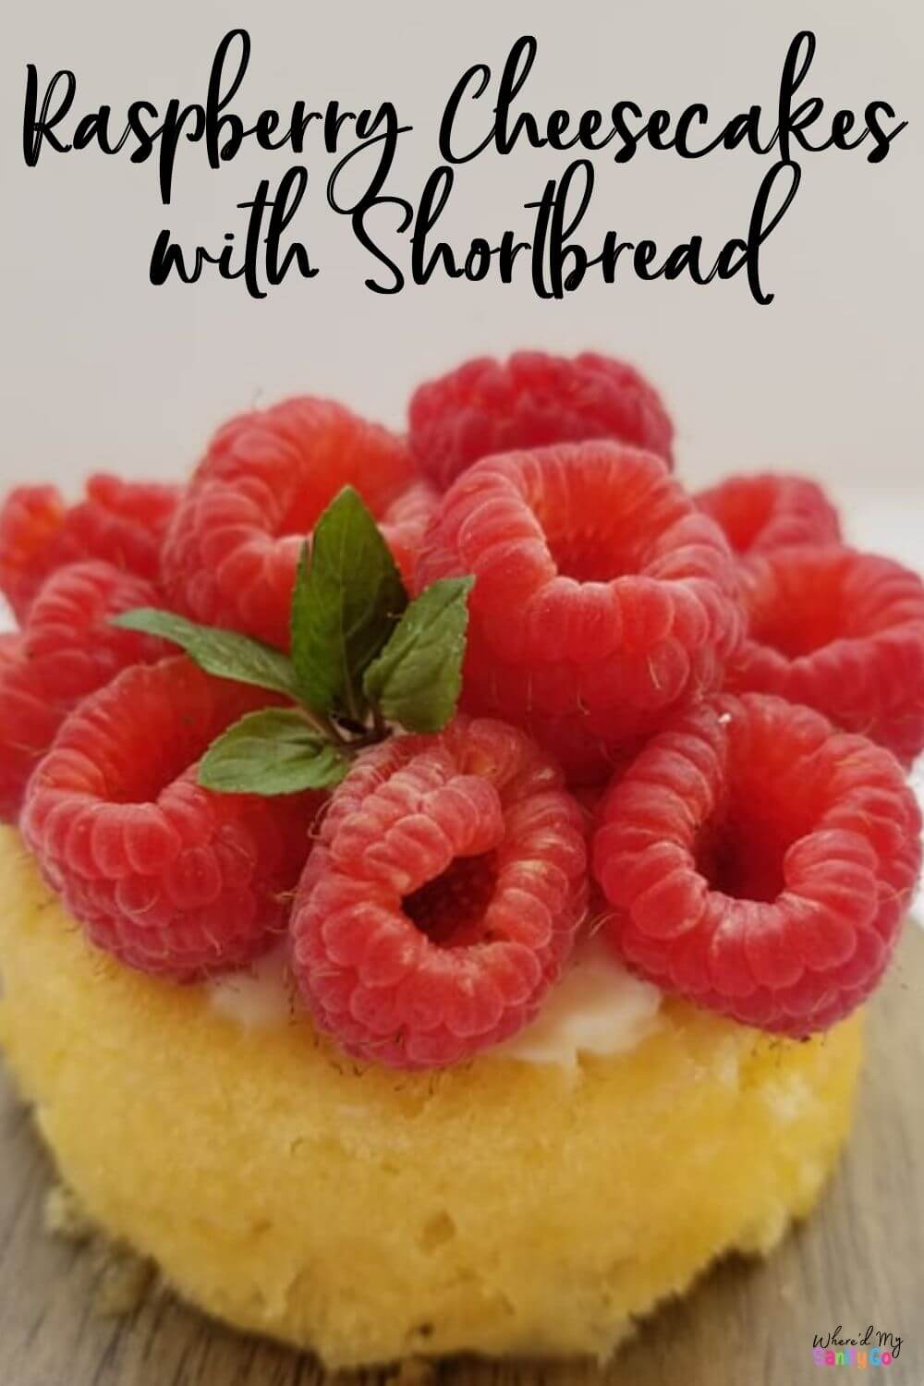 Raspberry Cheesecake Recipe with Shortcake